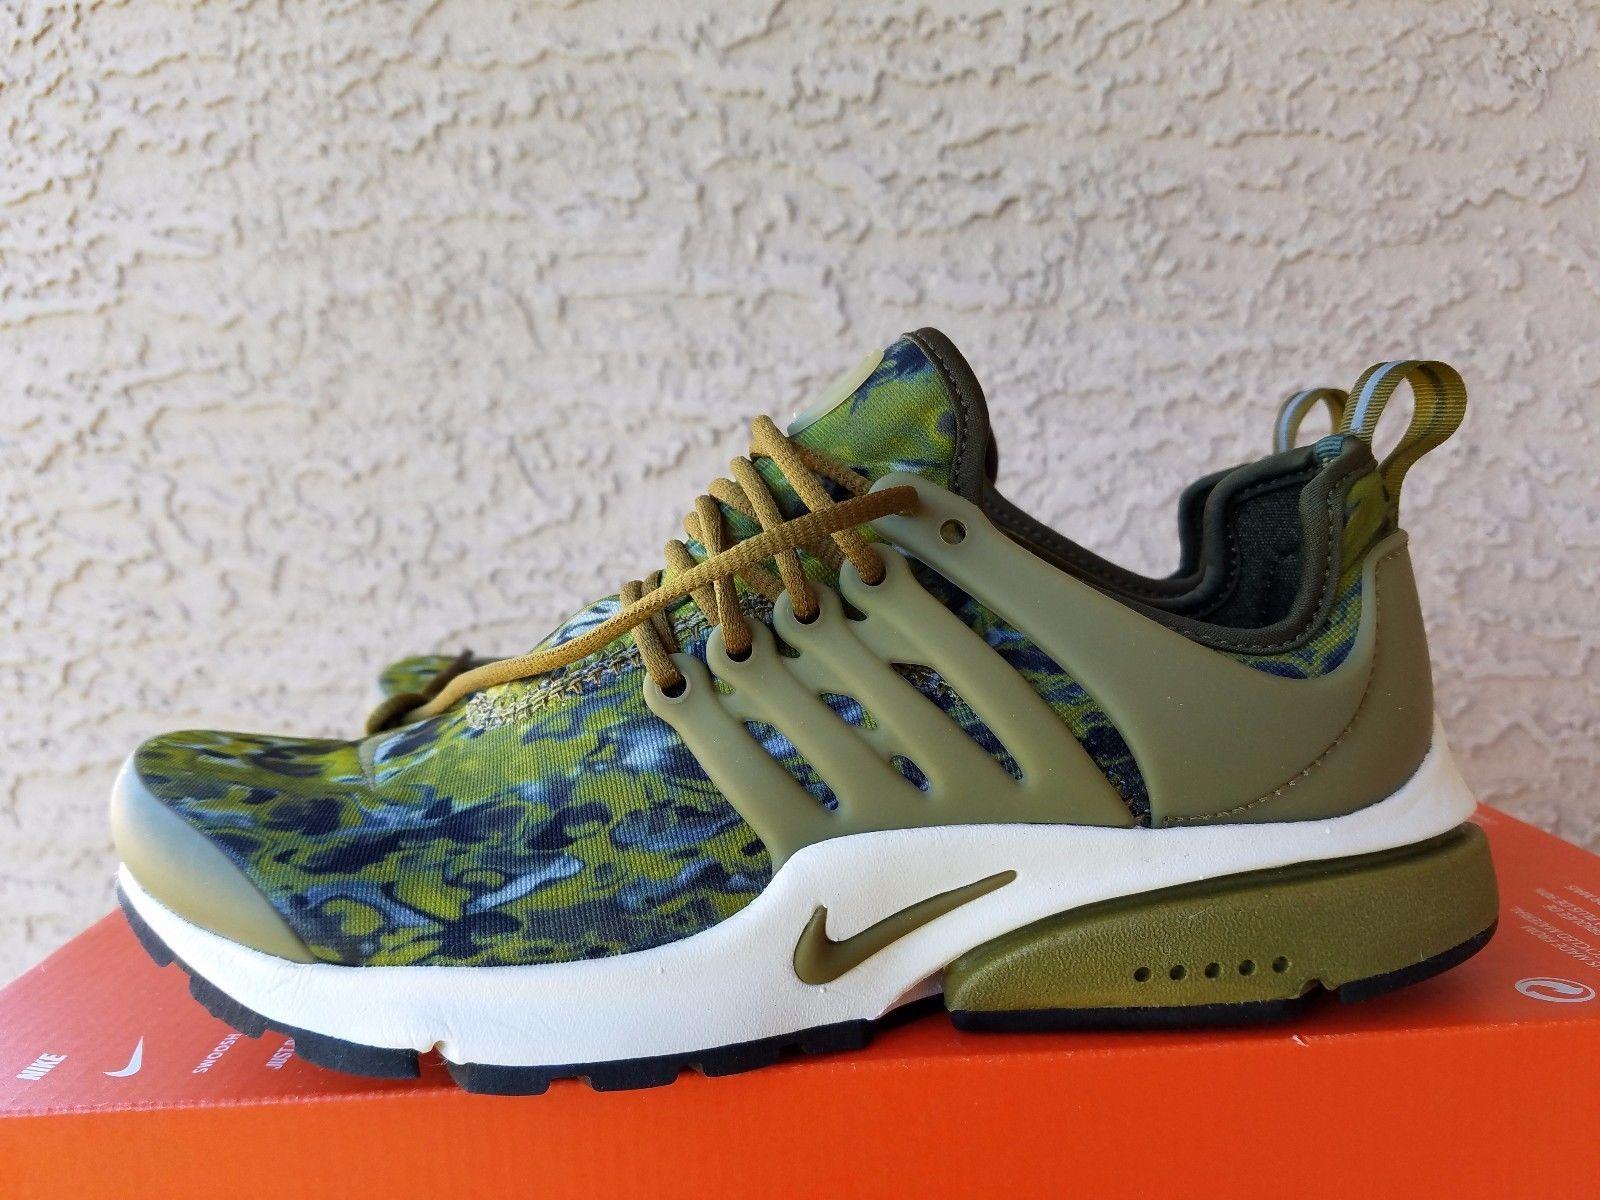 Tiranía pescado medida  Nike Women's Air Presto GPX Army Green Camo 844891-300 Sample Size XS (US  6-7) | Women shoes, Nike women, Green camo